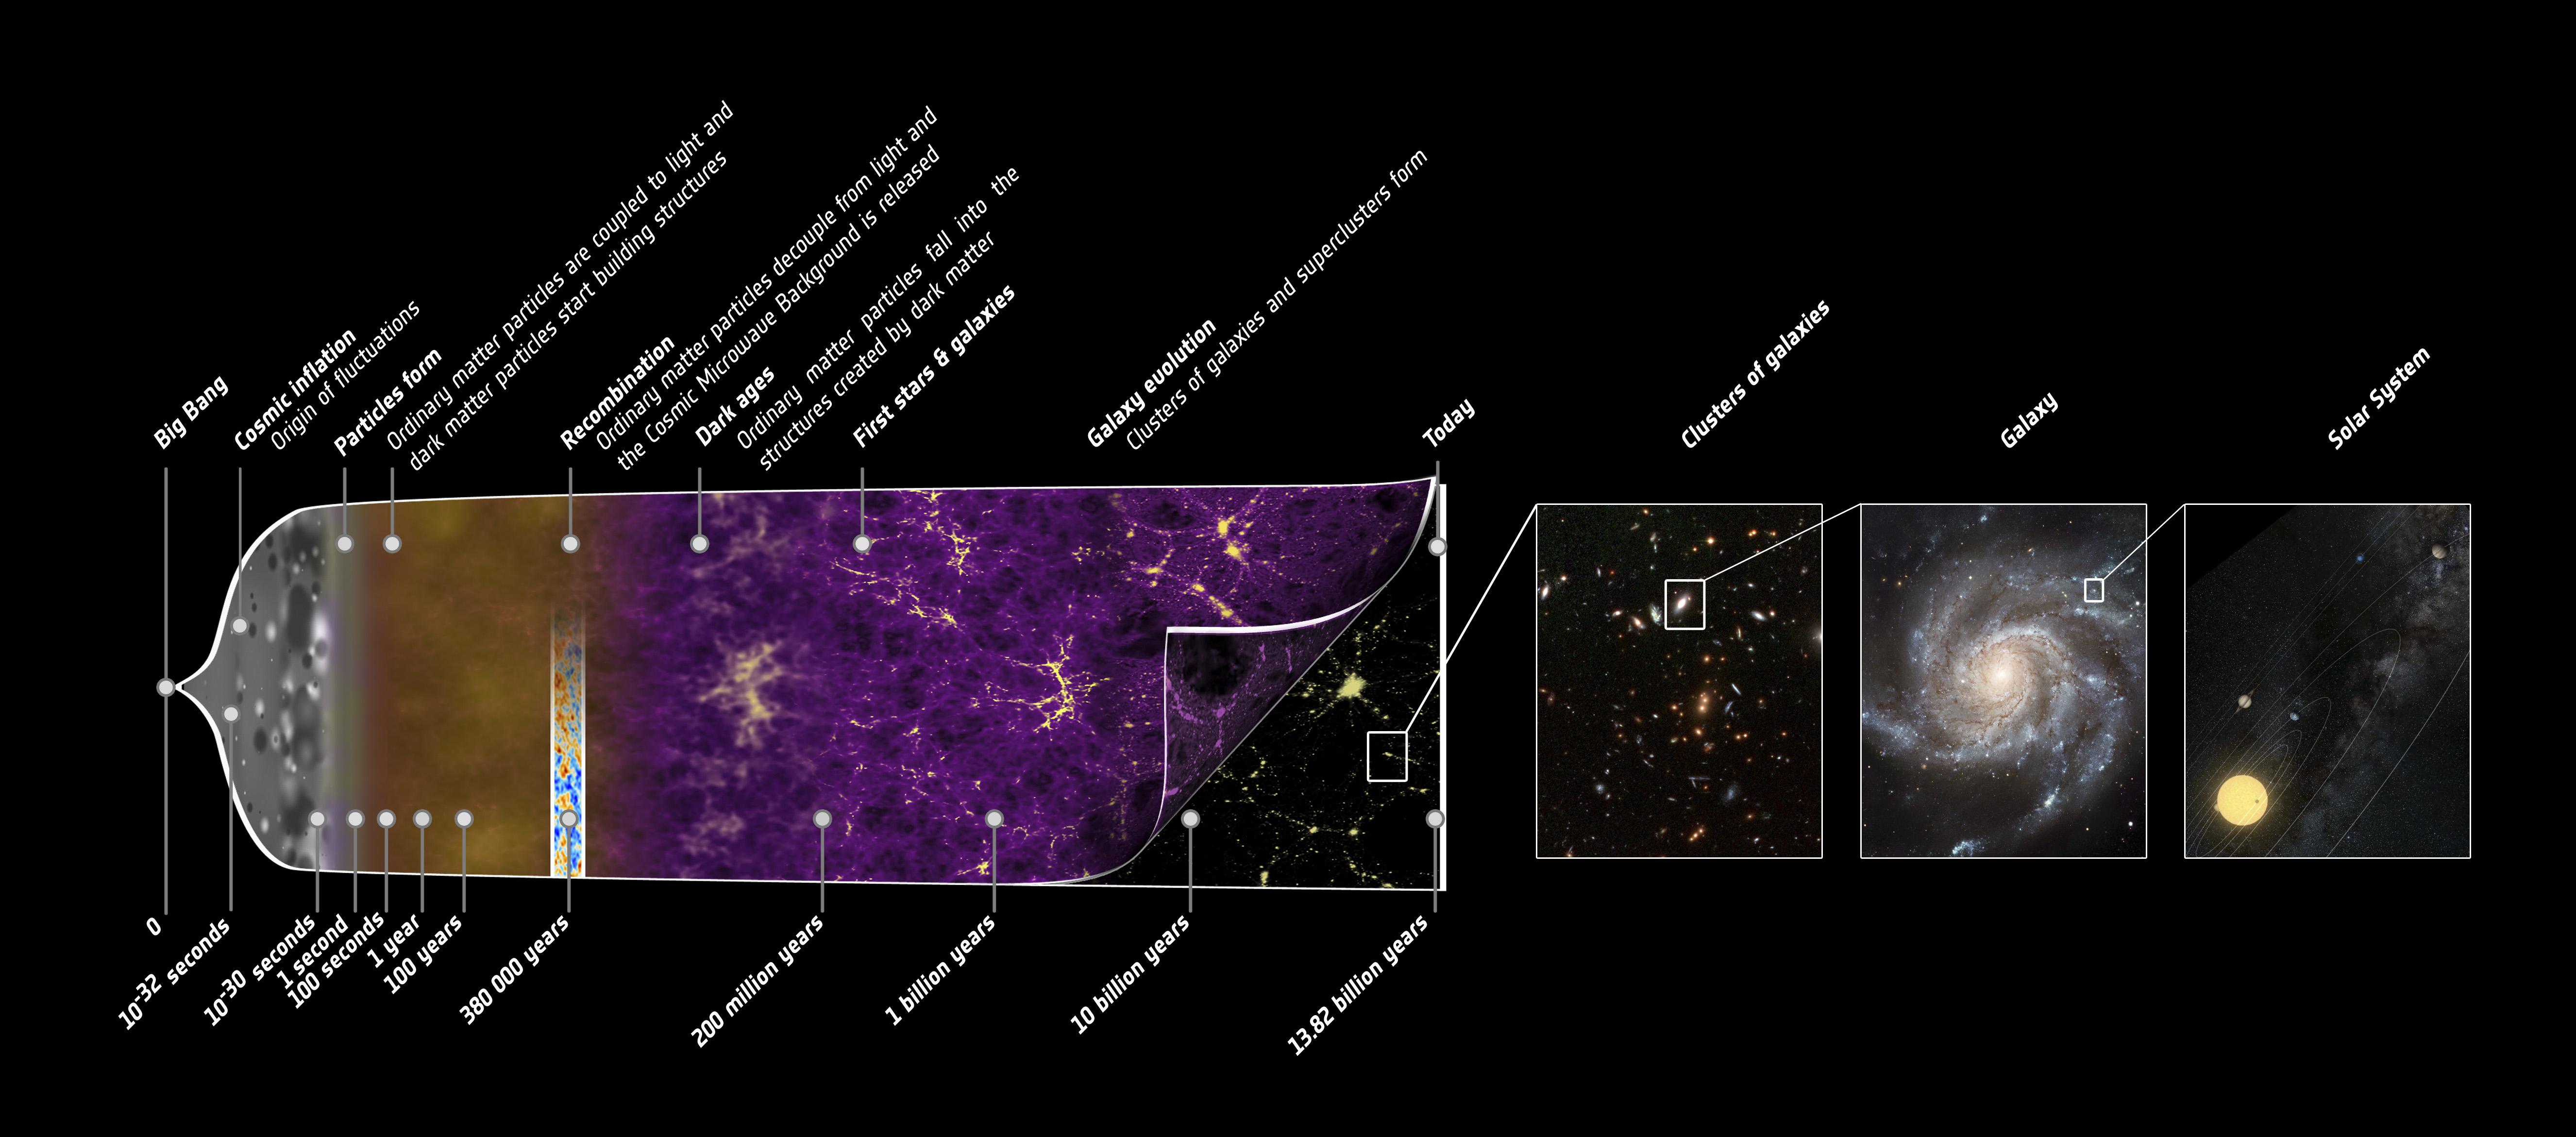 http://www.esa.int/var/esa/storage/images/esa_multimedia/images/2013/03/planck_history_of_universe/12584080-5-eng-GB/Planck_history_of_Universe.jpg